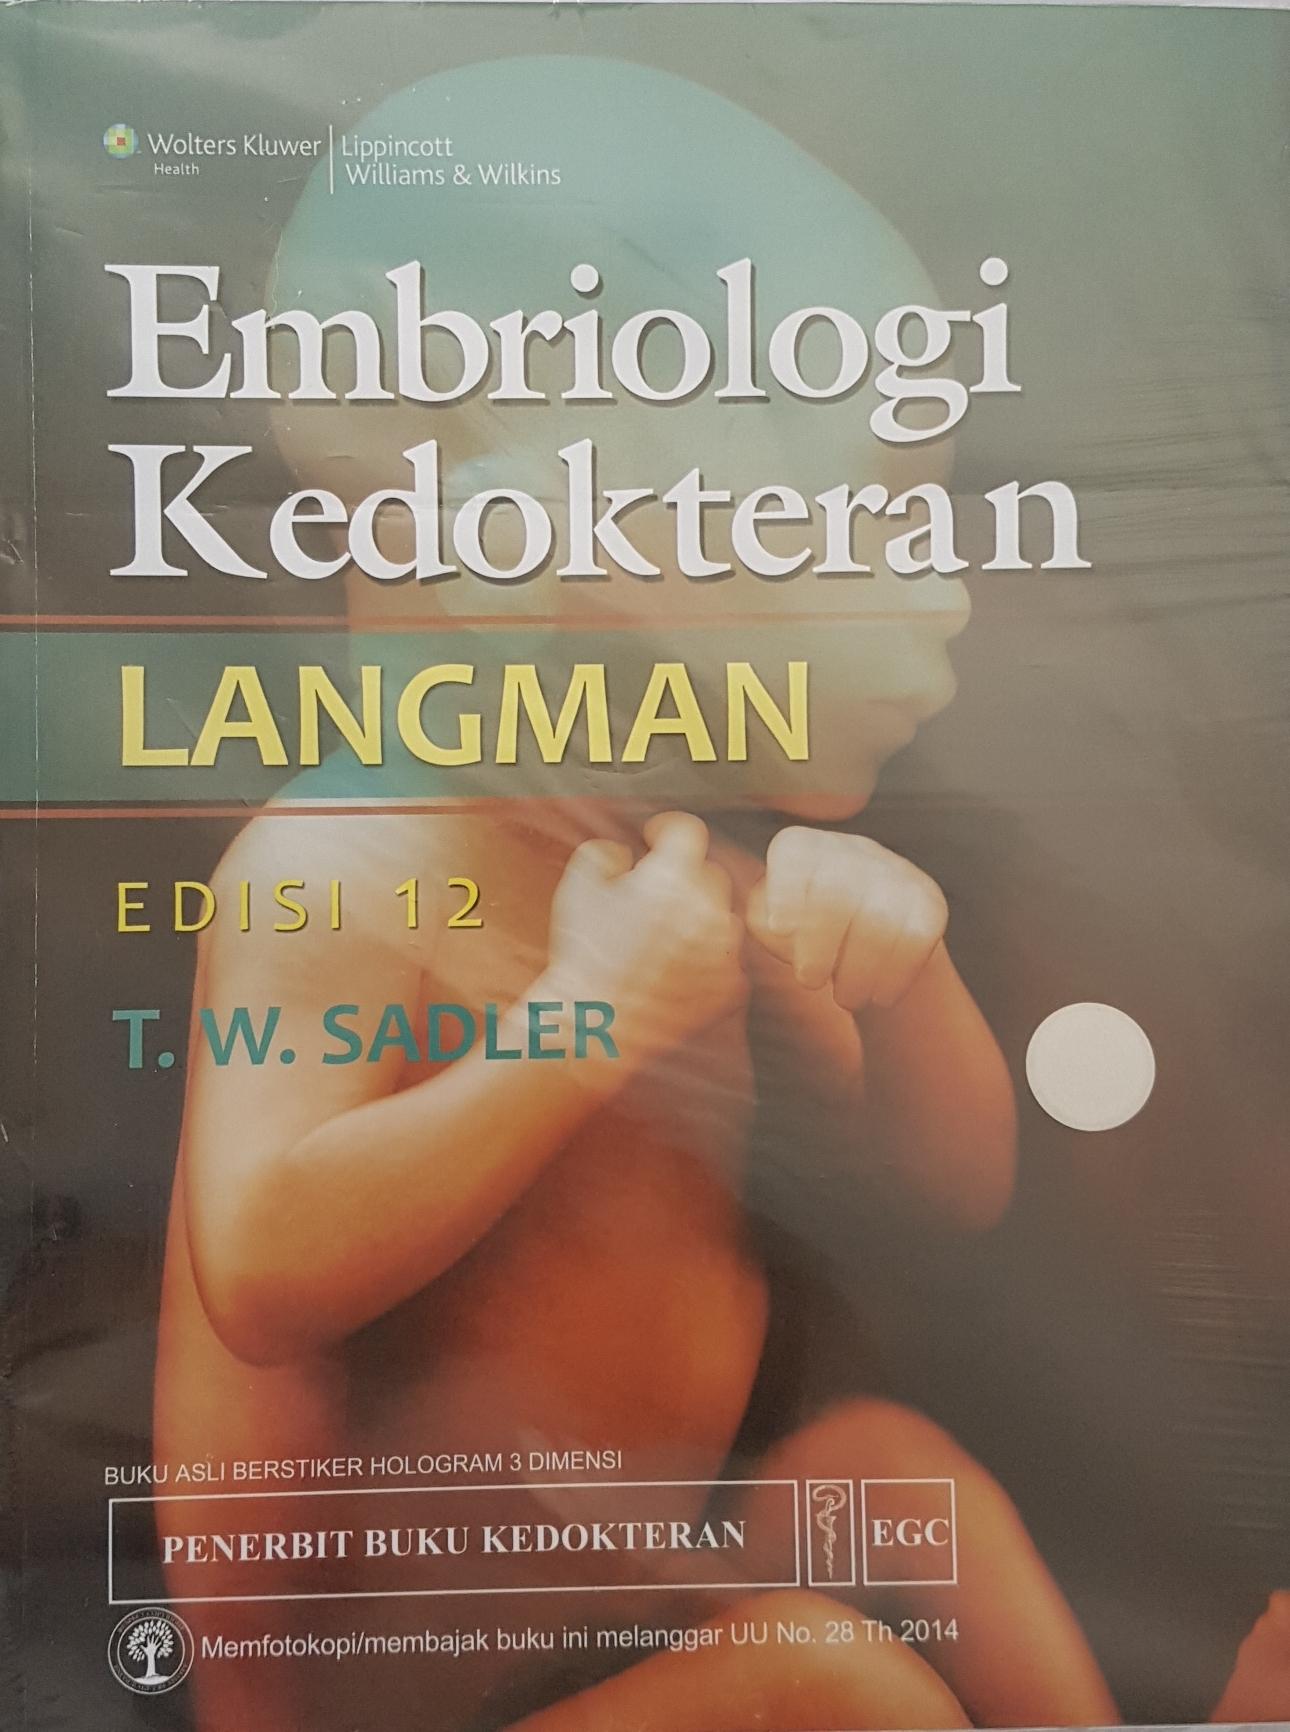 [ORIGINAL] Embriologi Kedokteran 12e Langman